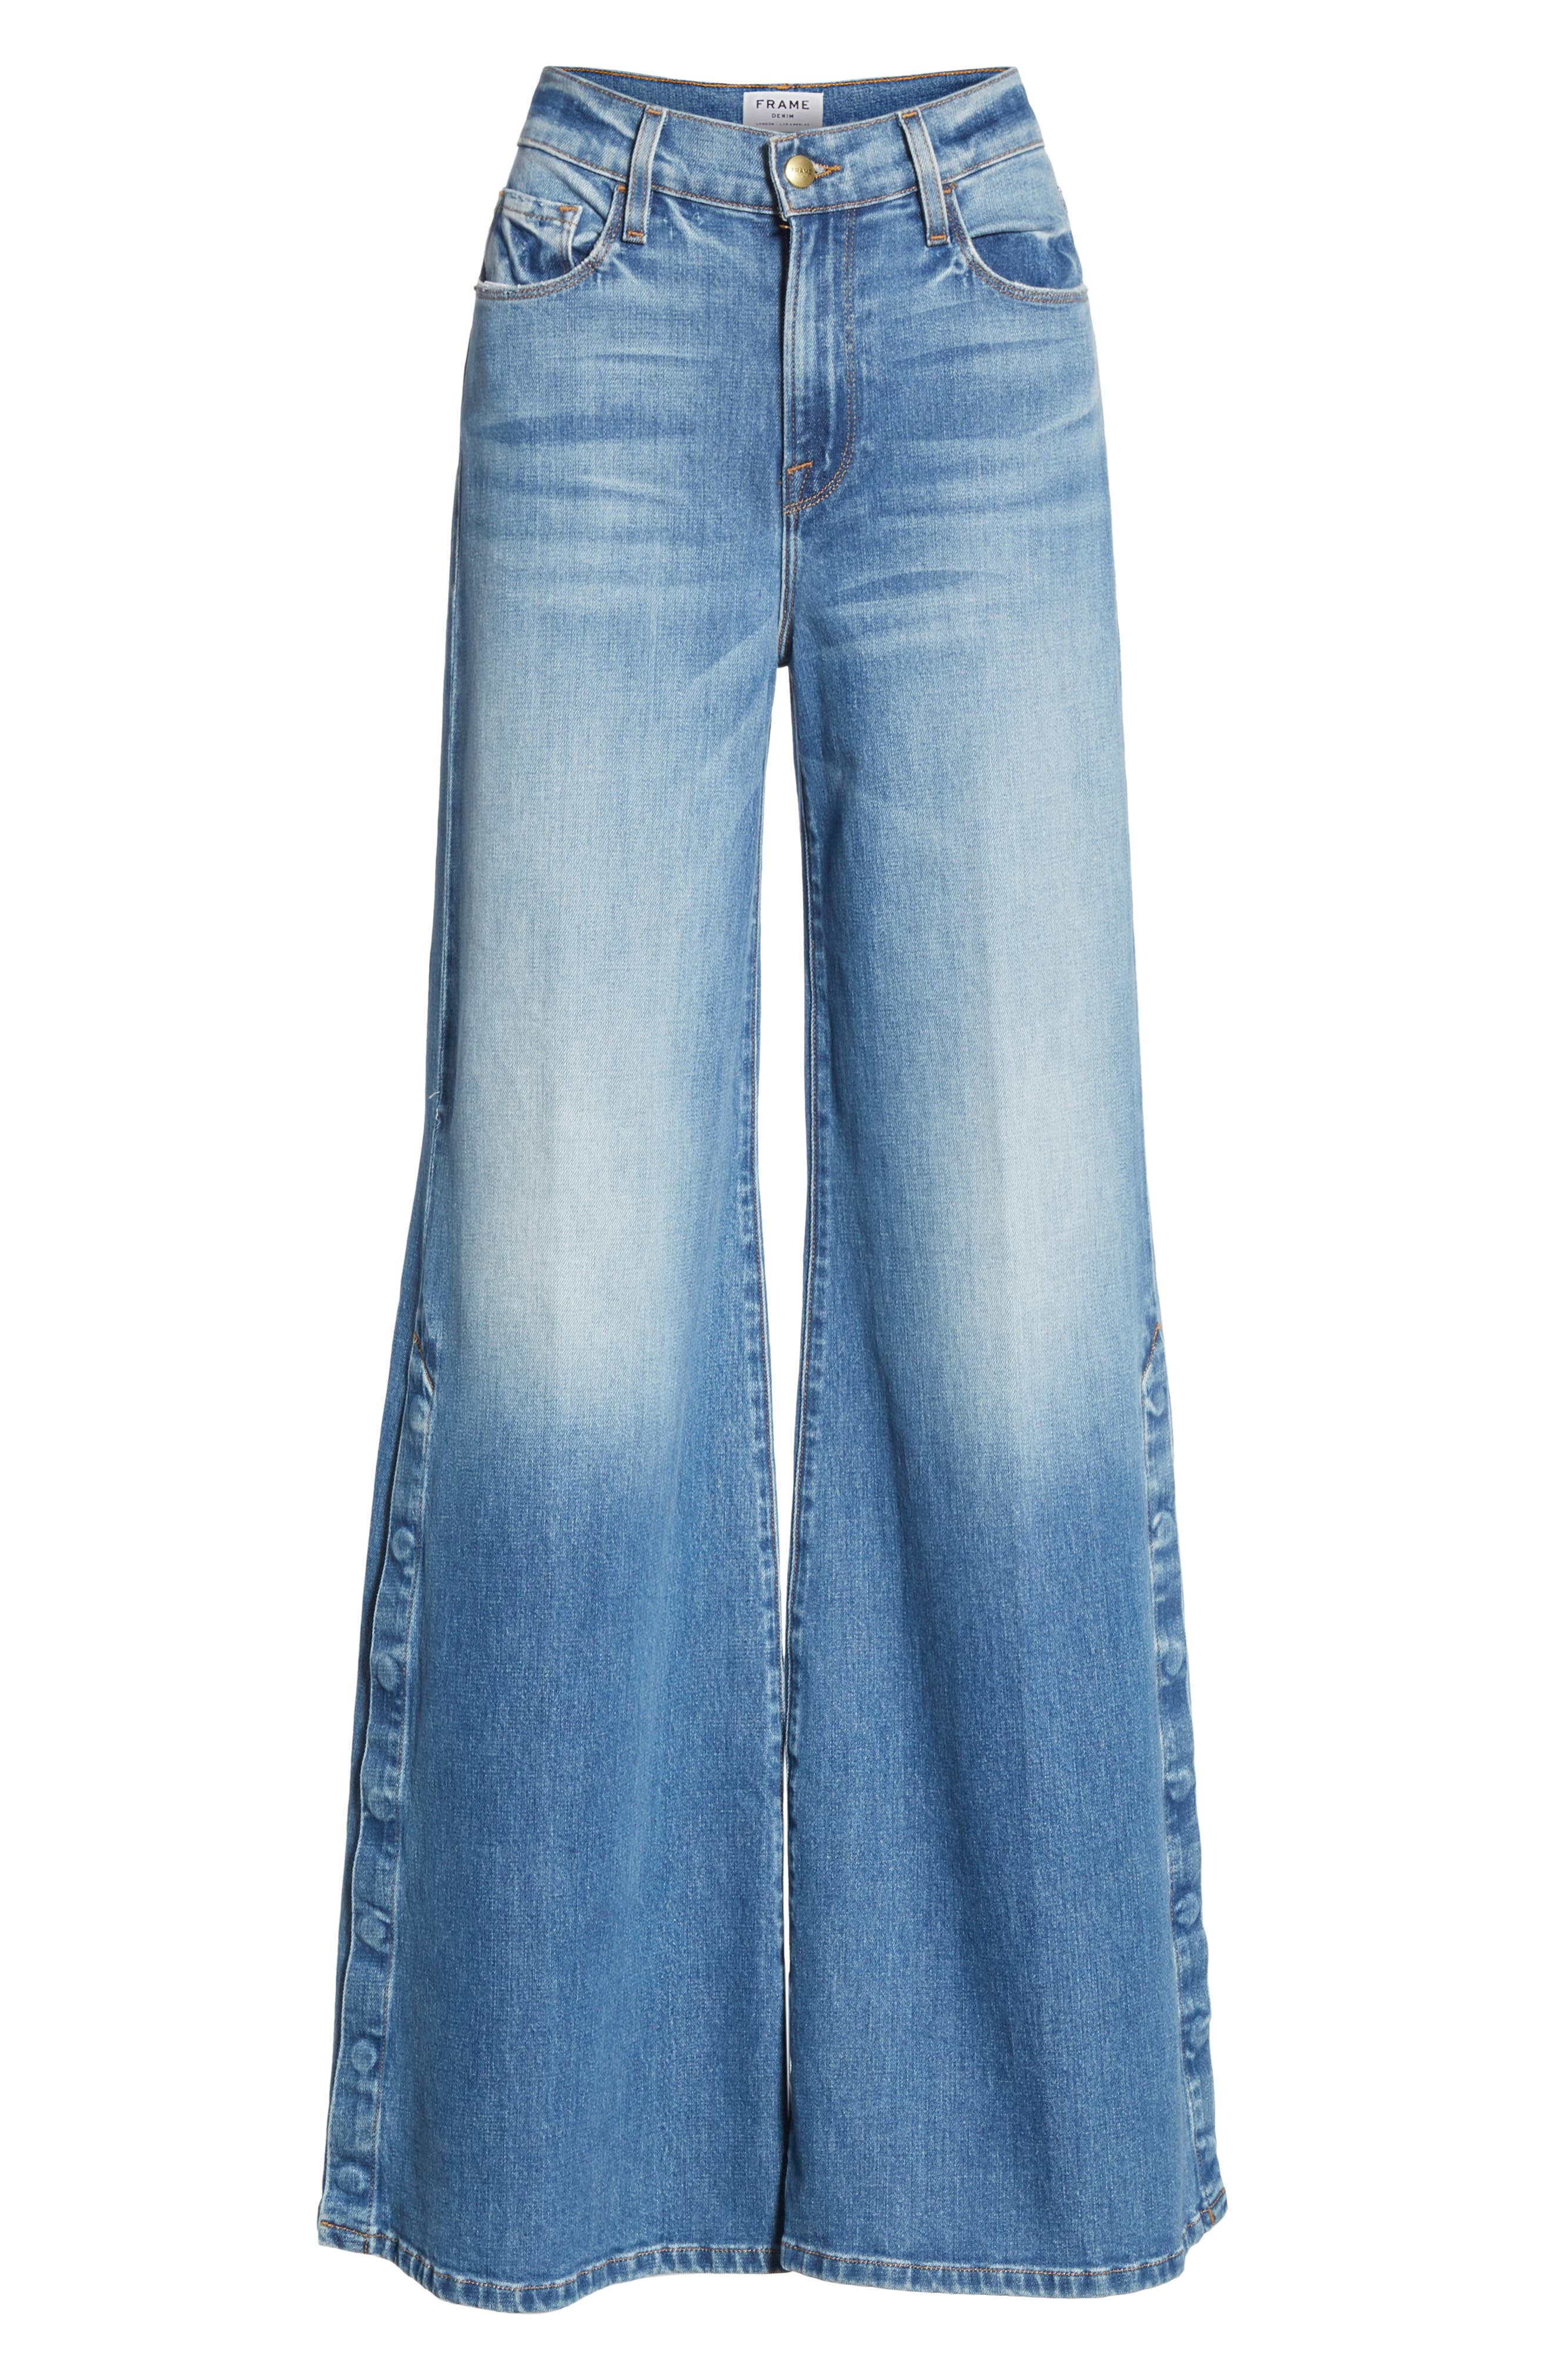 FRAME, Le Palazzo Snap Away Hem Wide Leg Jeans, Alternate thumbnail 6, color, 420